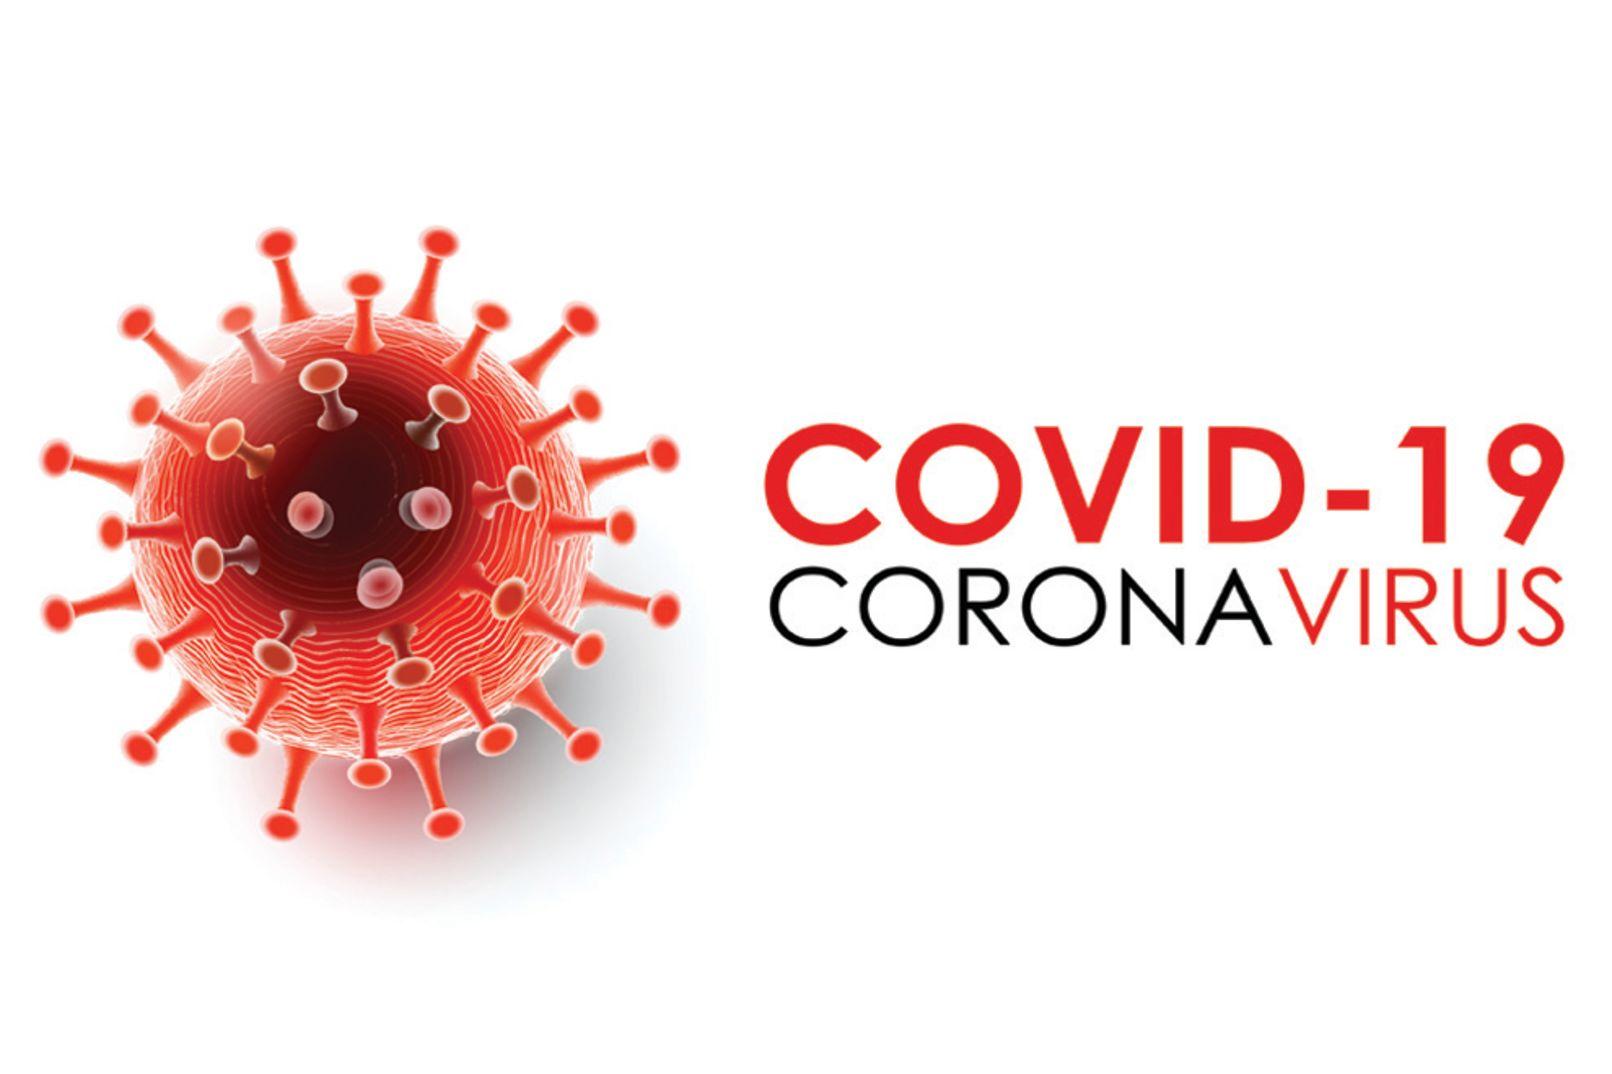 coronavirus-covid-19-ce-qu-il-faut-savoir